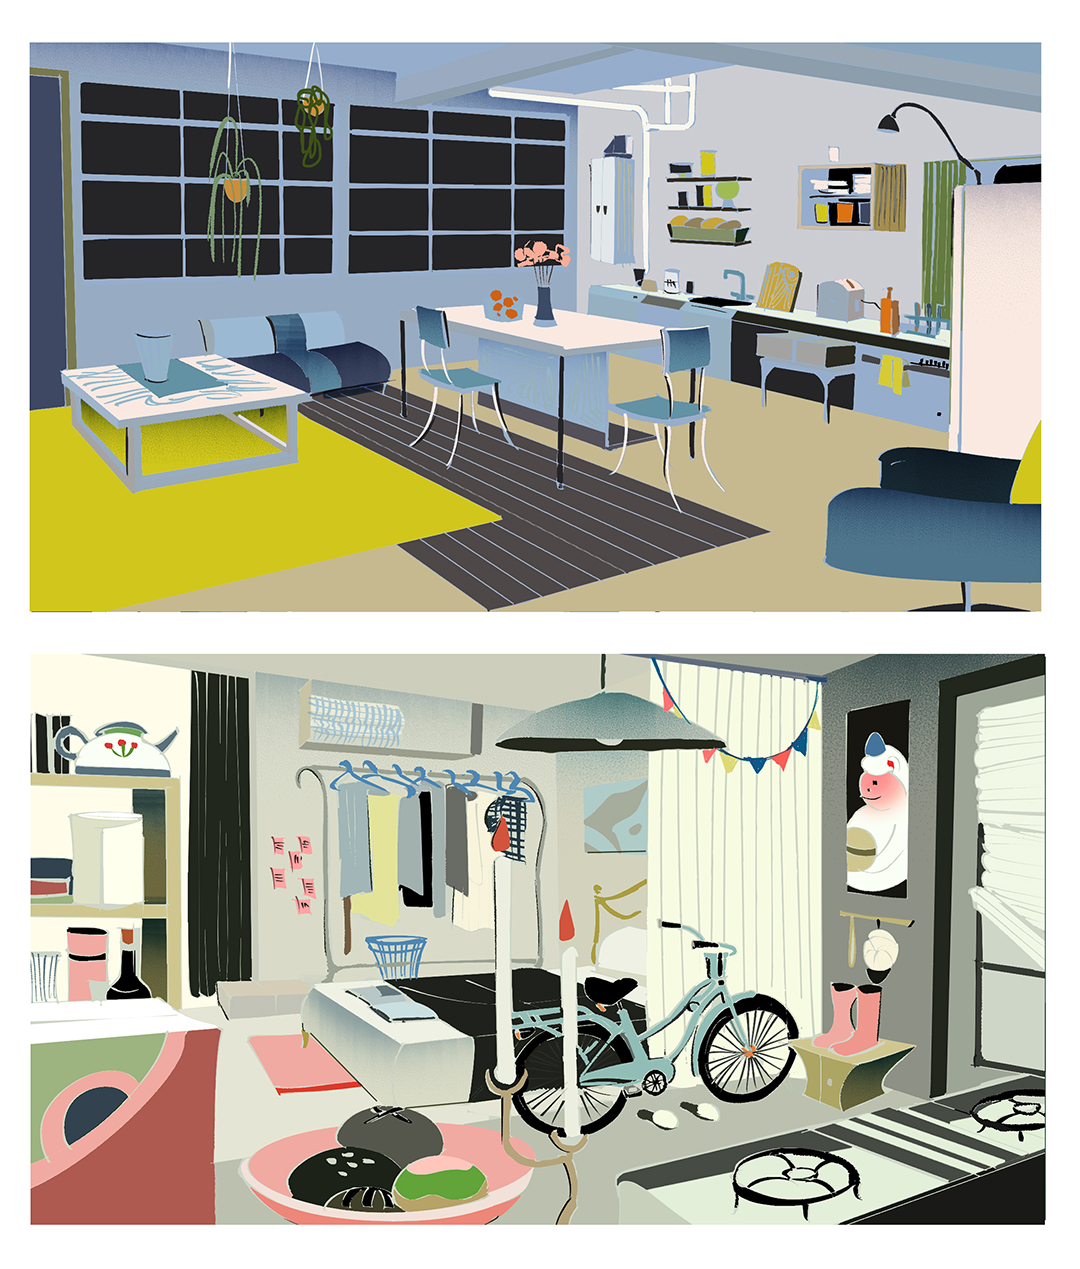 GirlsclubAsia-Illustrator-Eve Liu-file26